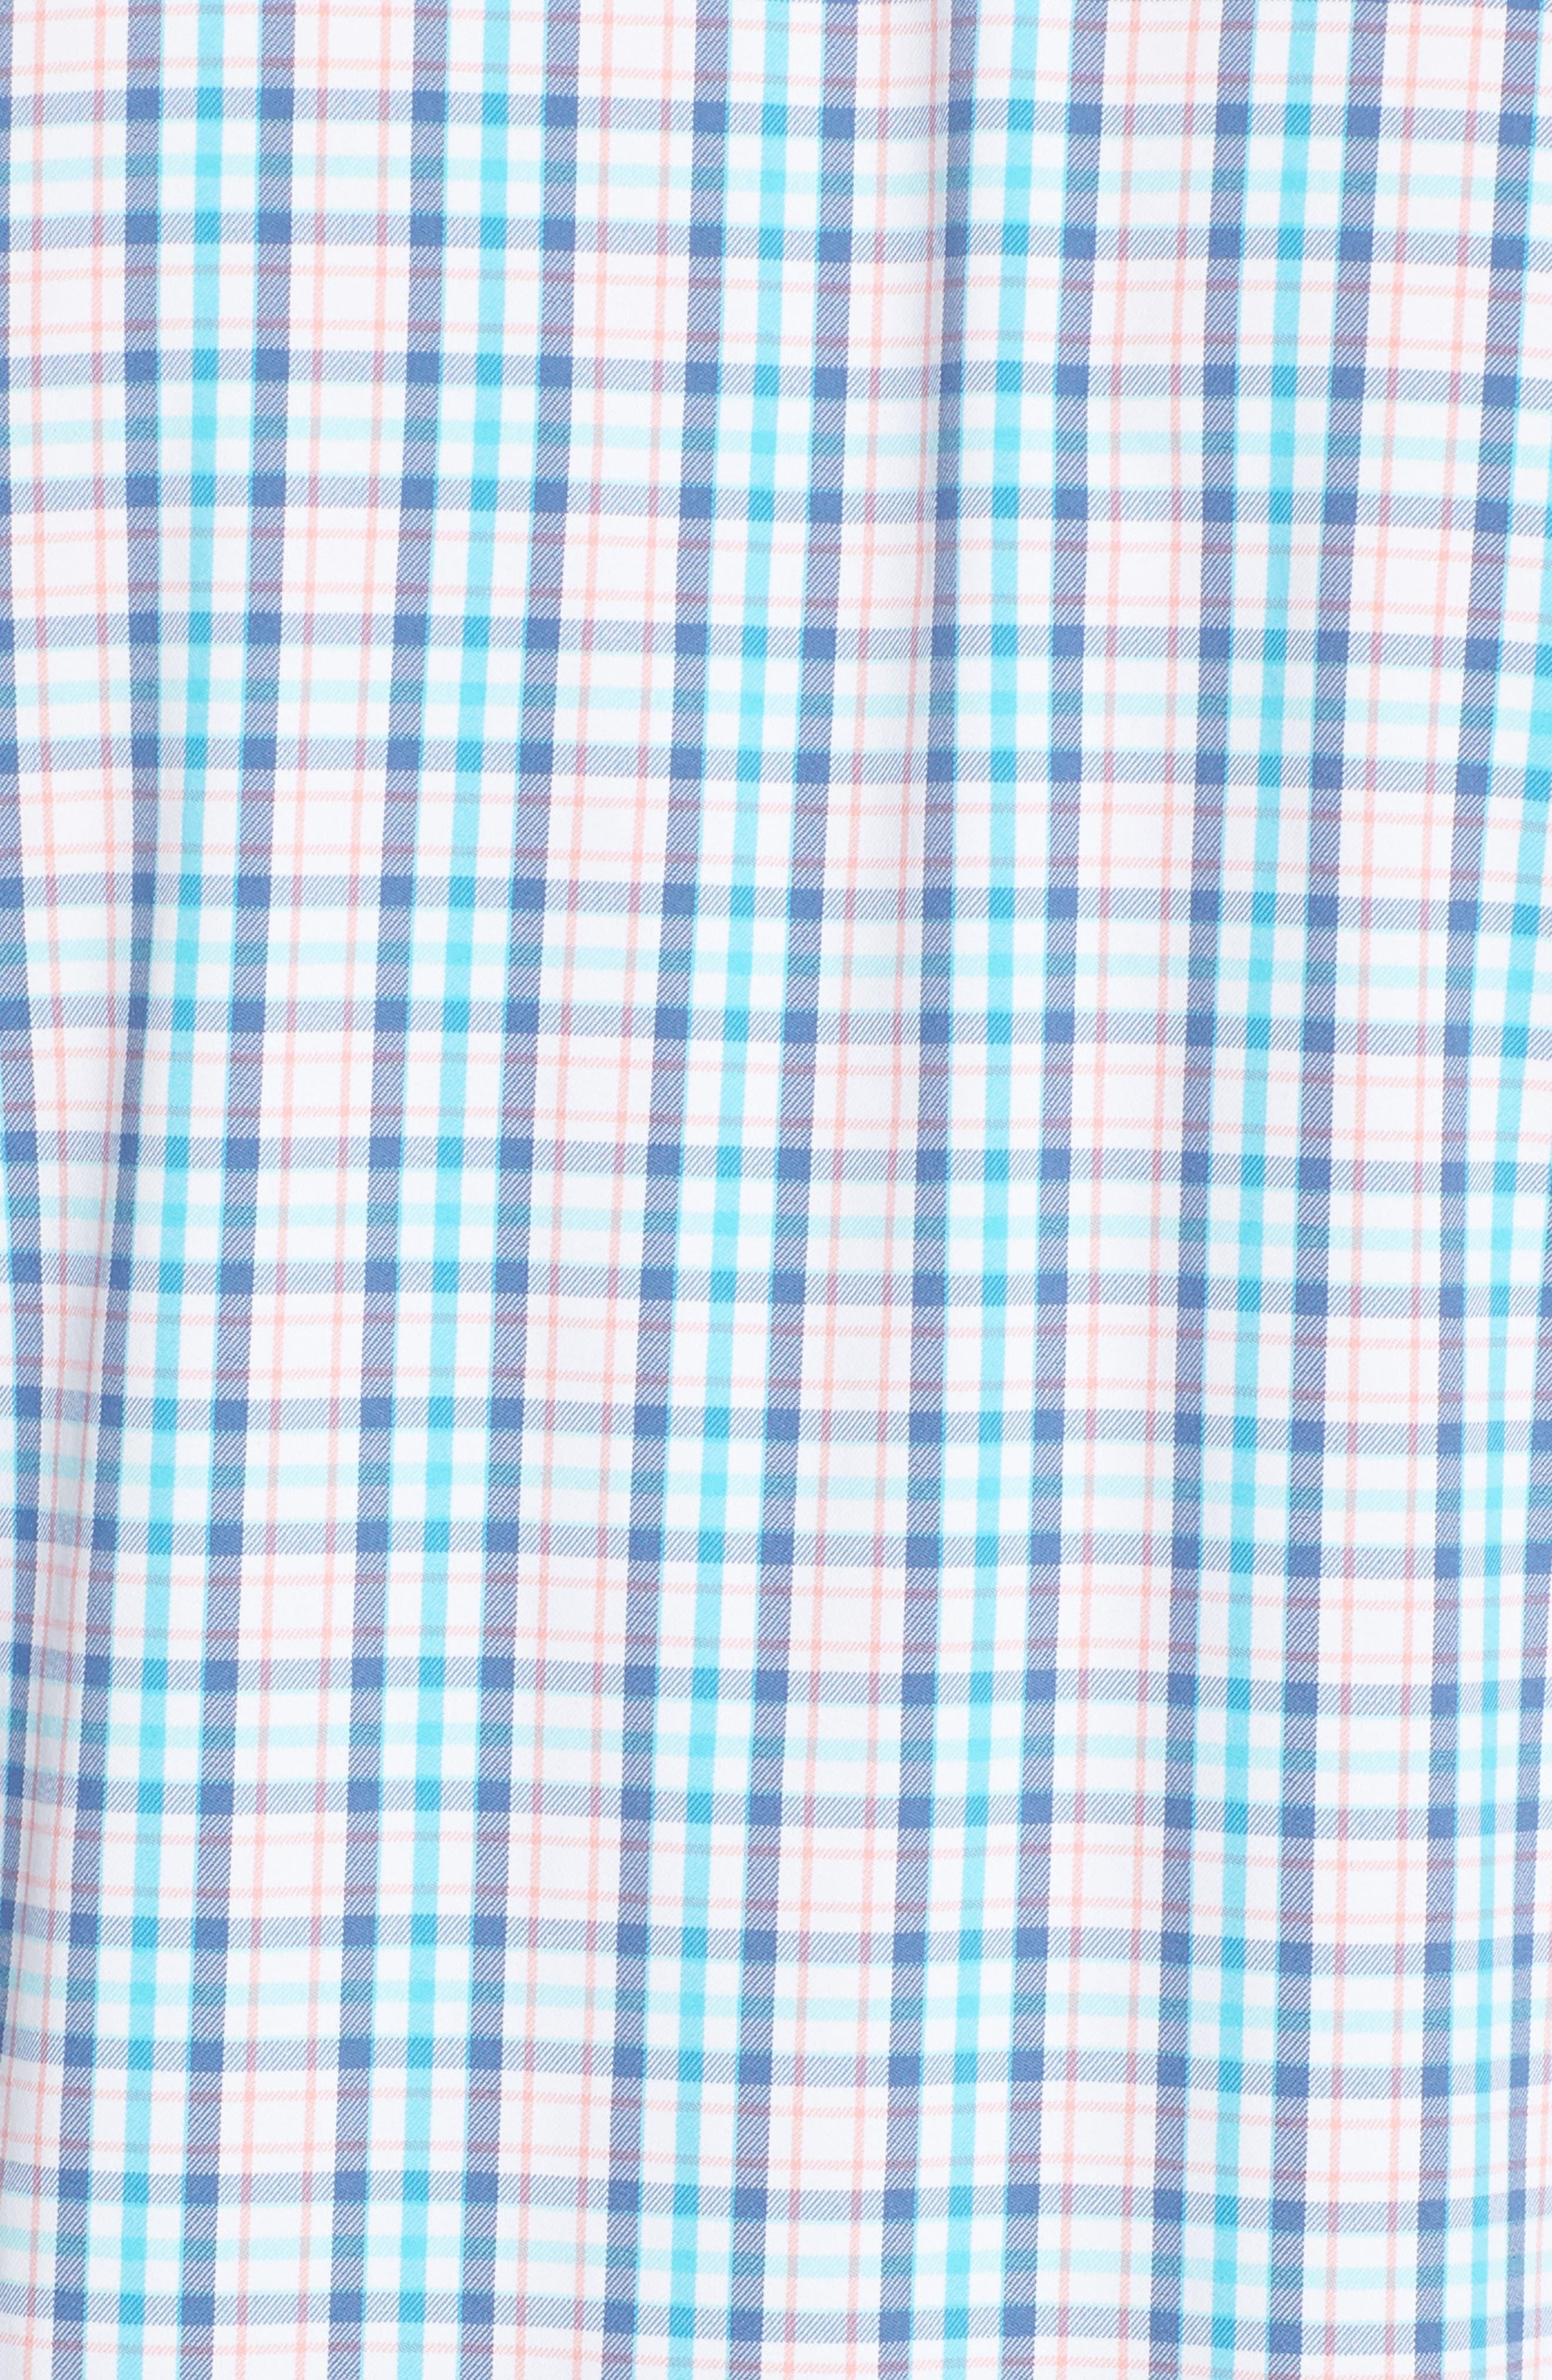 Intercoastal Surfsong Plaid Performance Sport Shirt,                             Alternate thumbnail 5, color,                             Seven Seas Blue